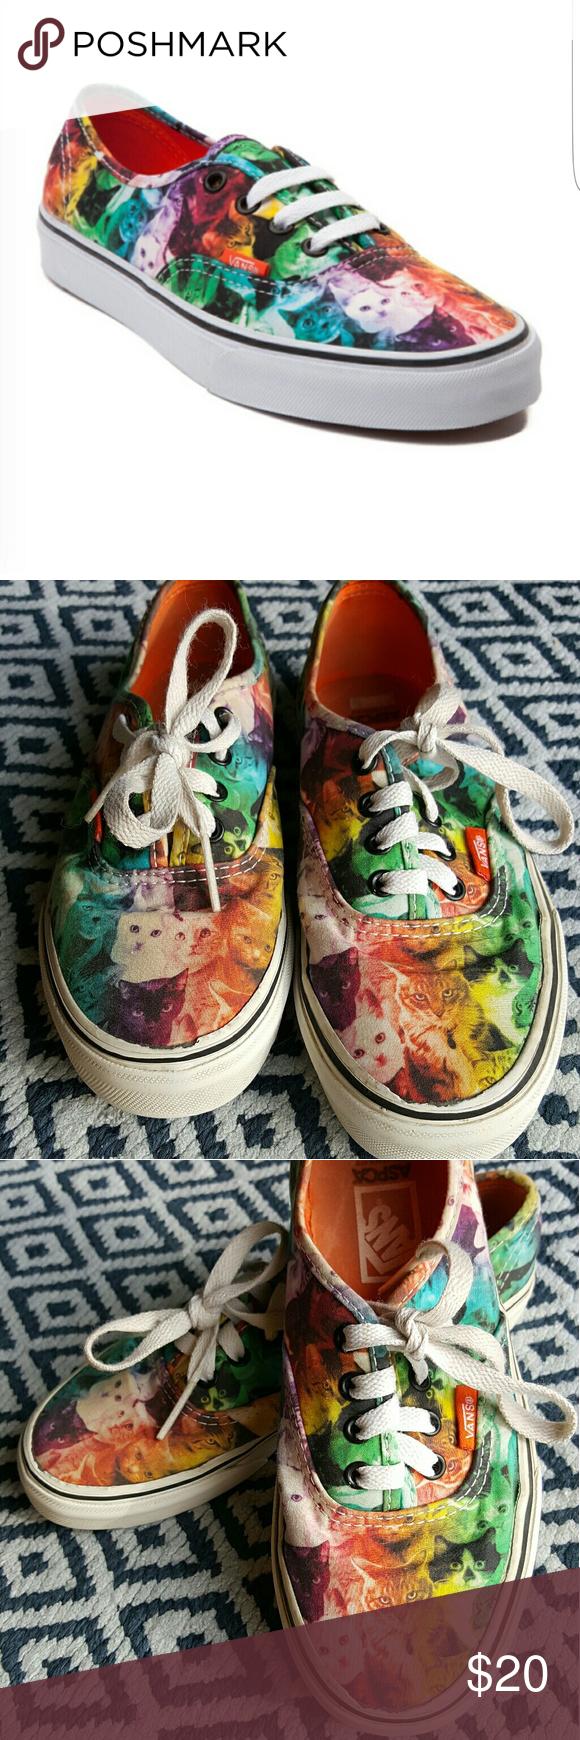 Vans Aspca Rainbow Kitten Cat Design Kids Sz 3 5 Rainbow Kittens Cat Design Vans